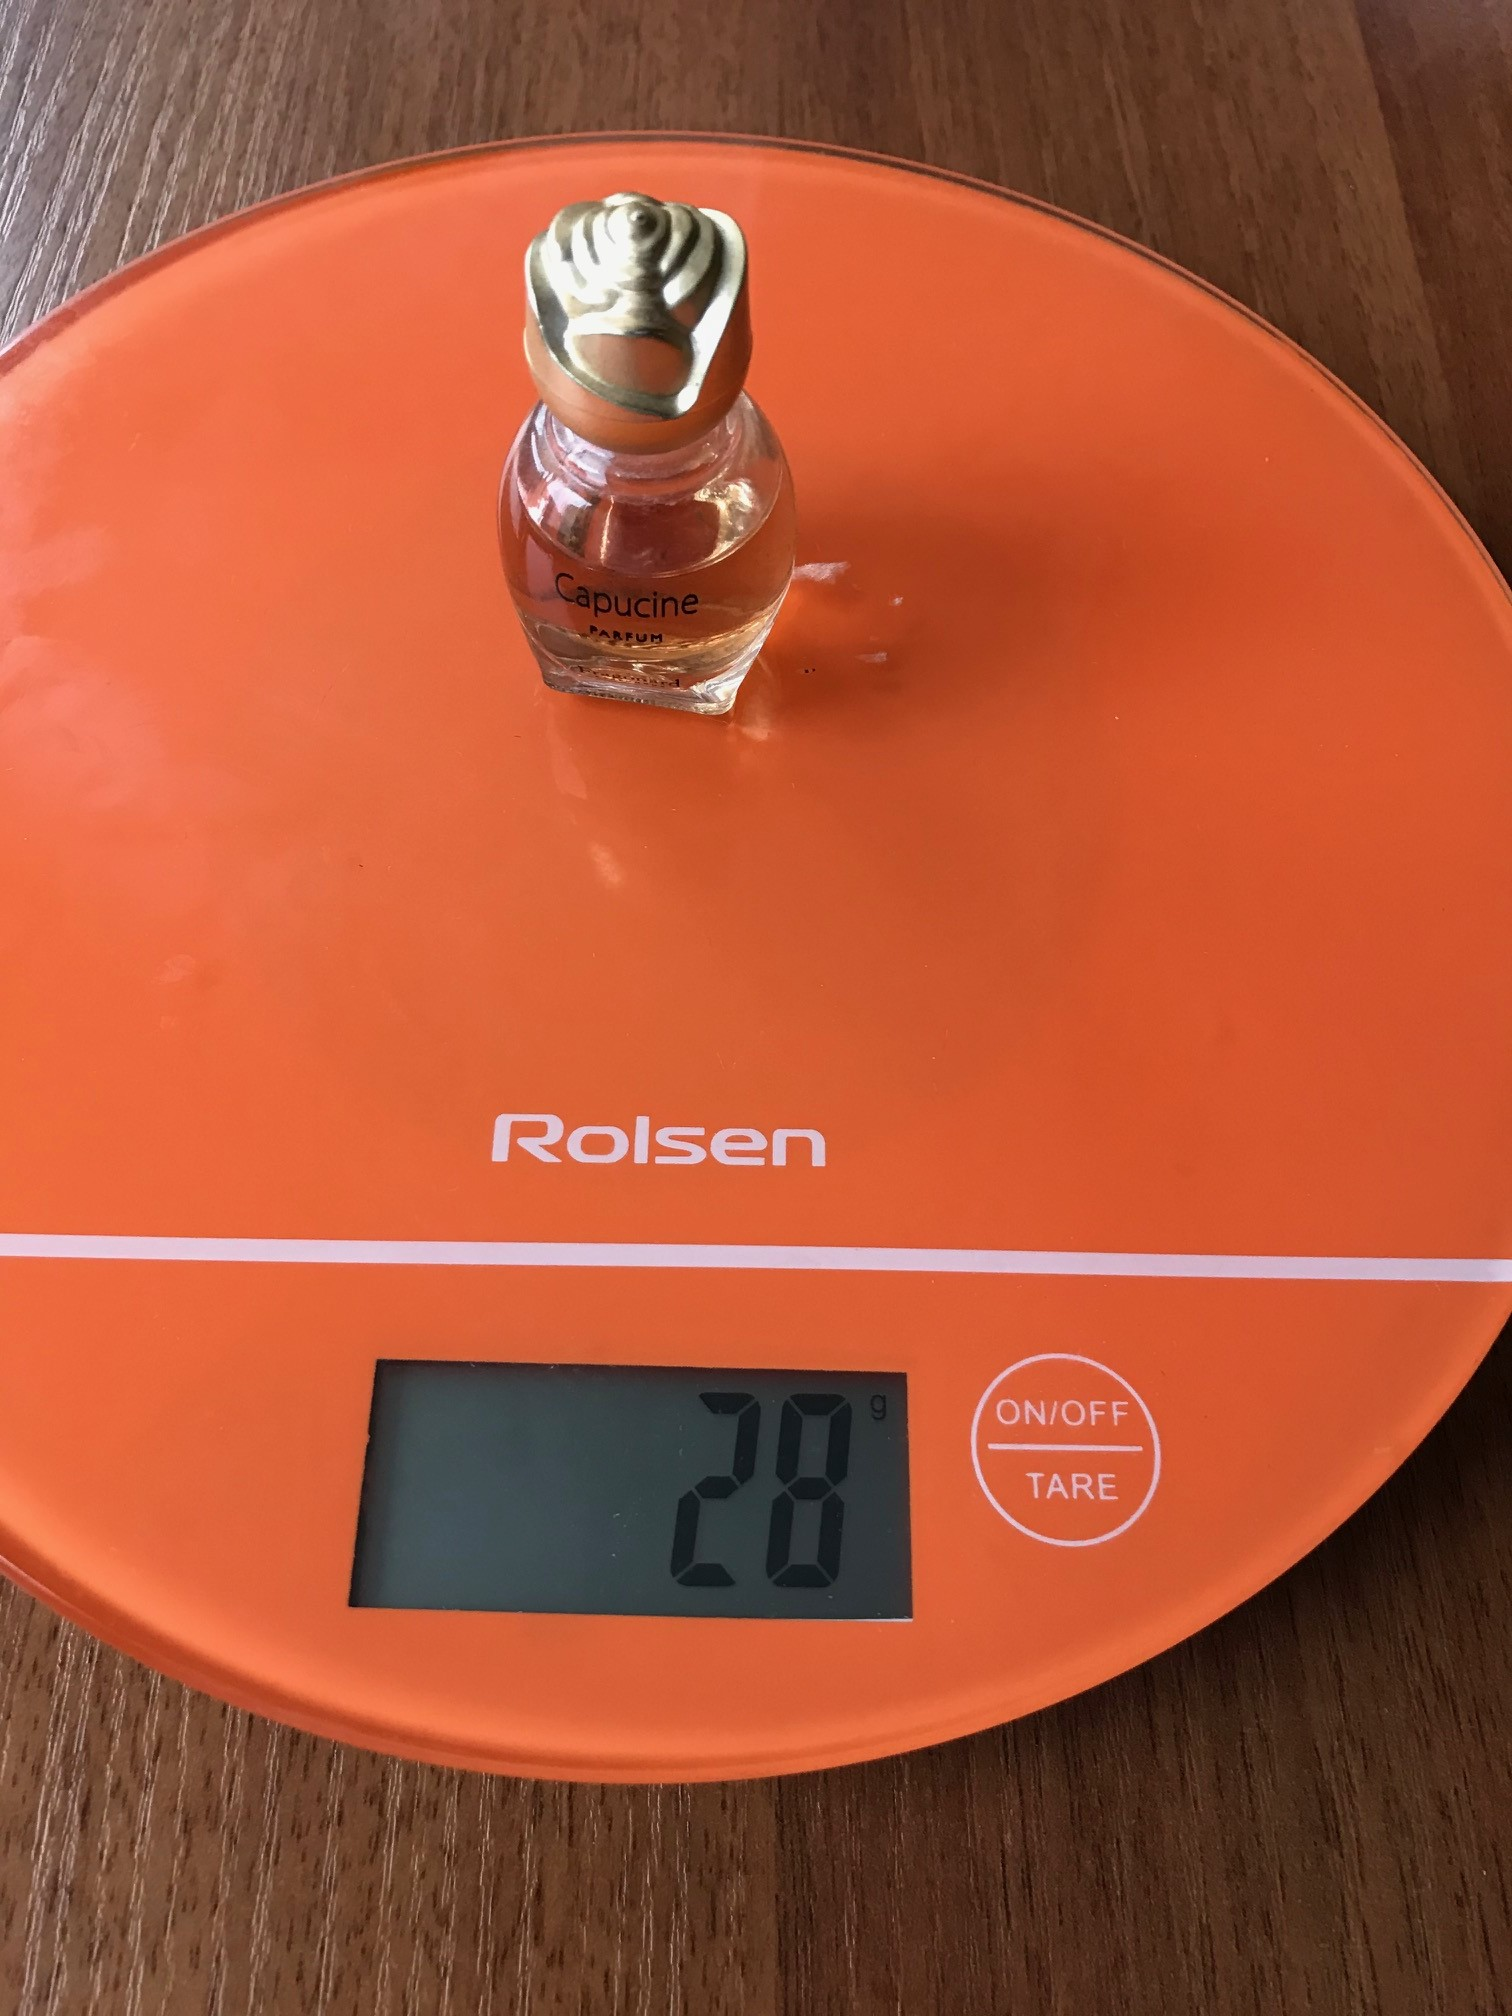 вес духов 15 мл